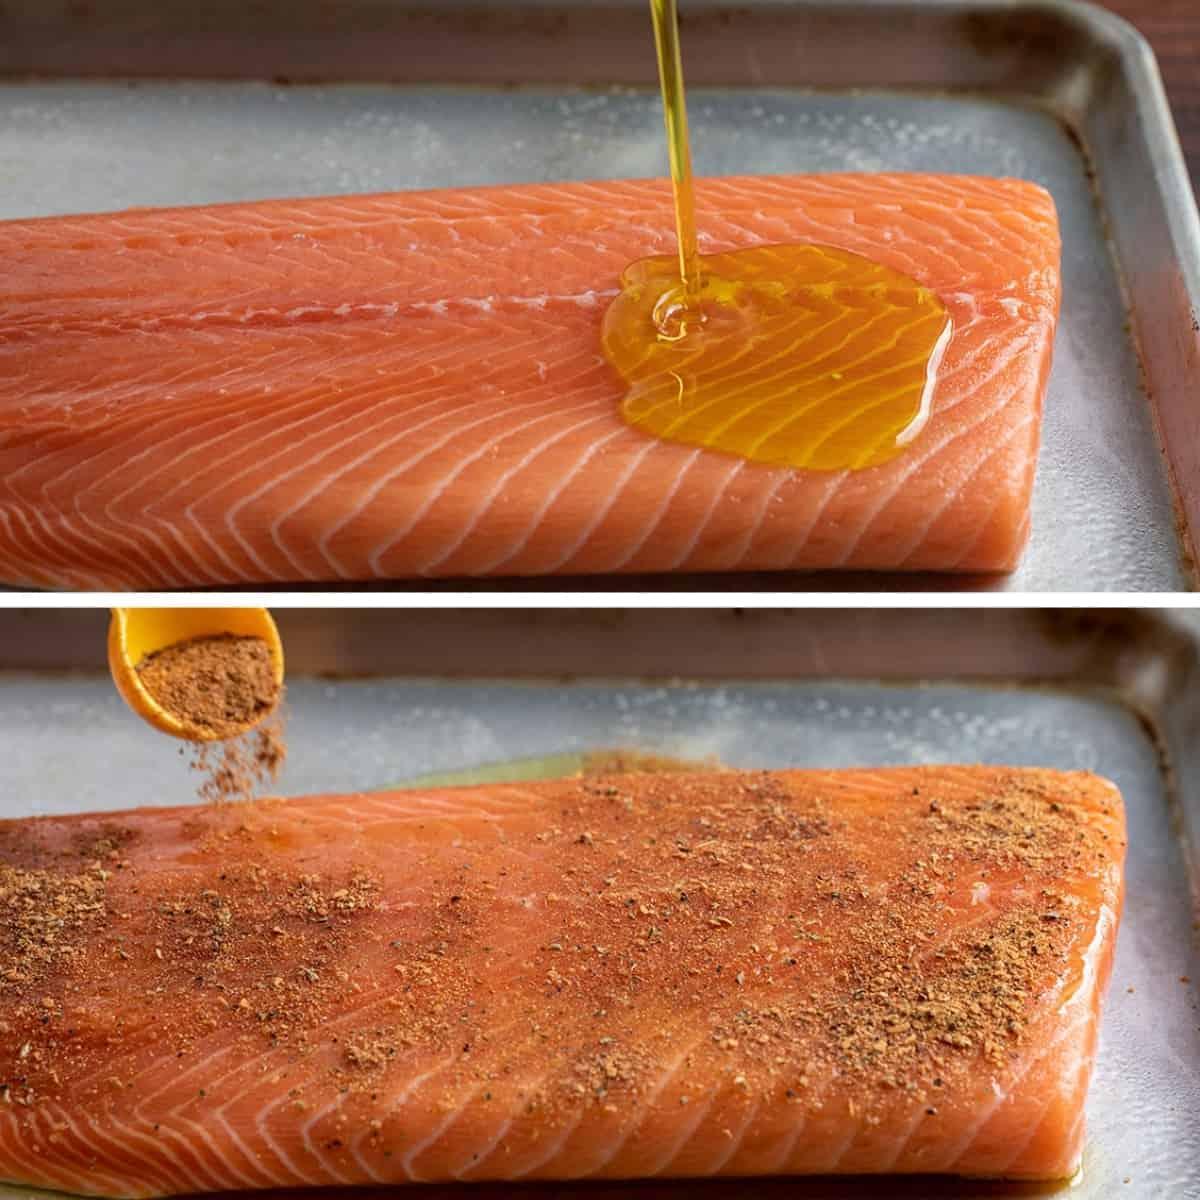 Preparing Salmon for Blackened Salmon